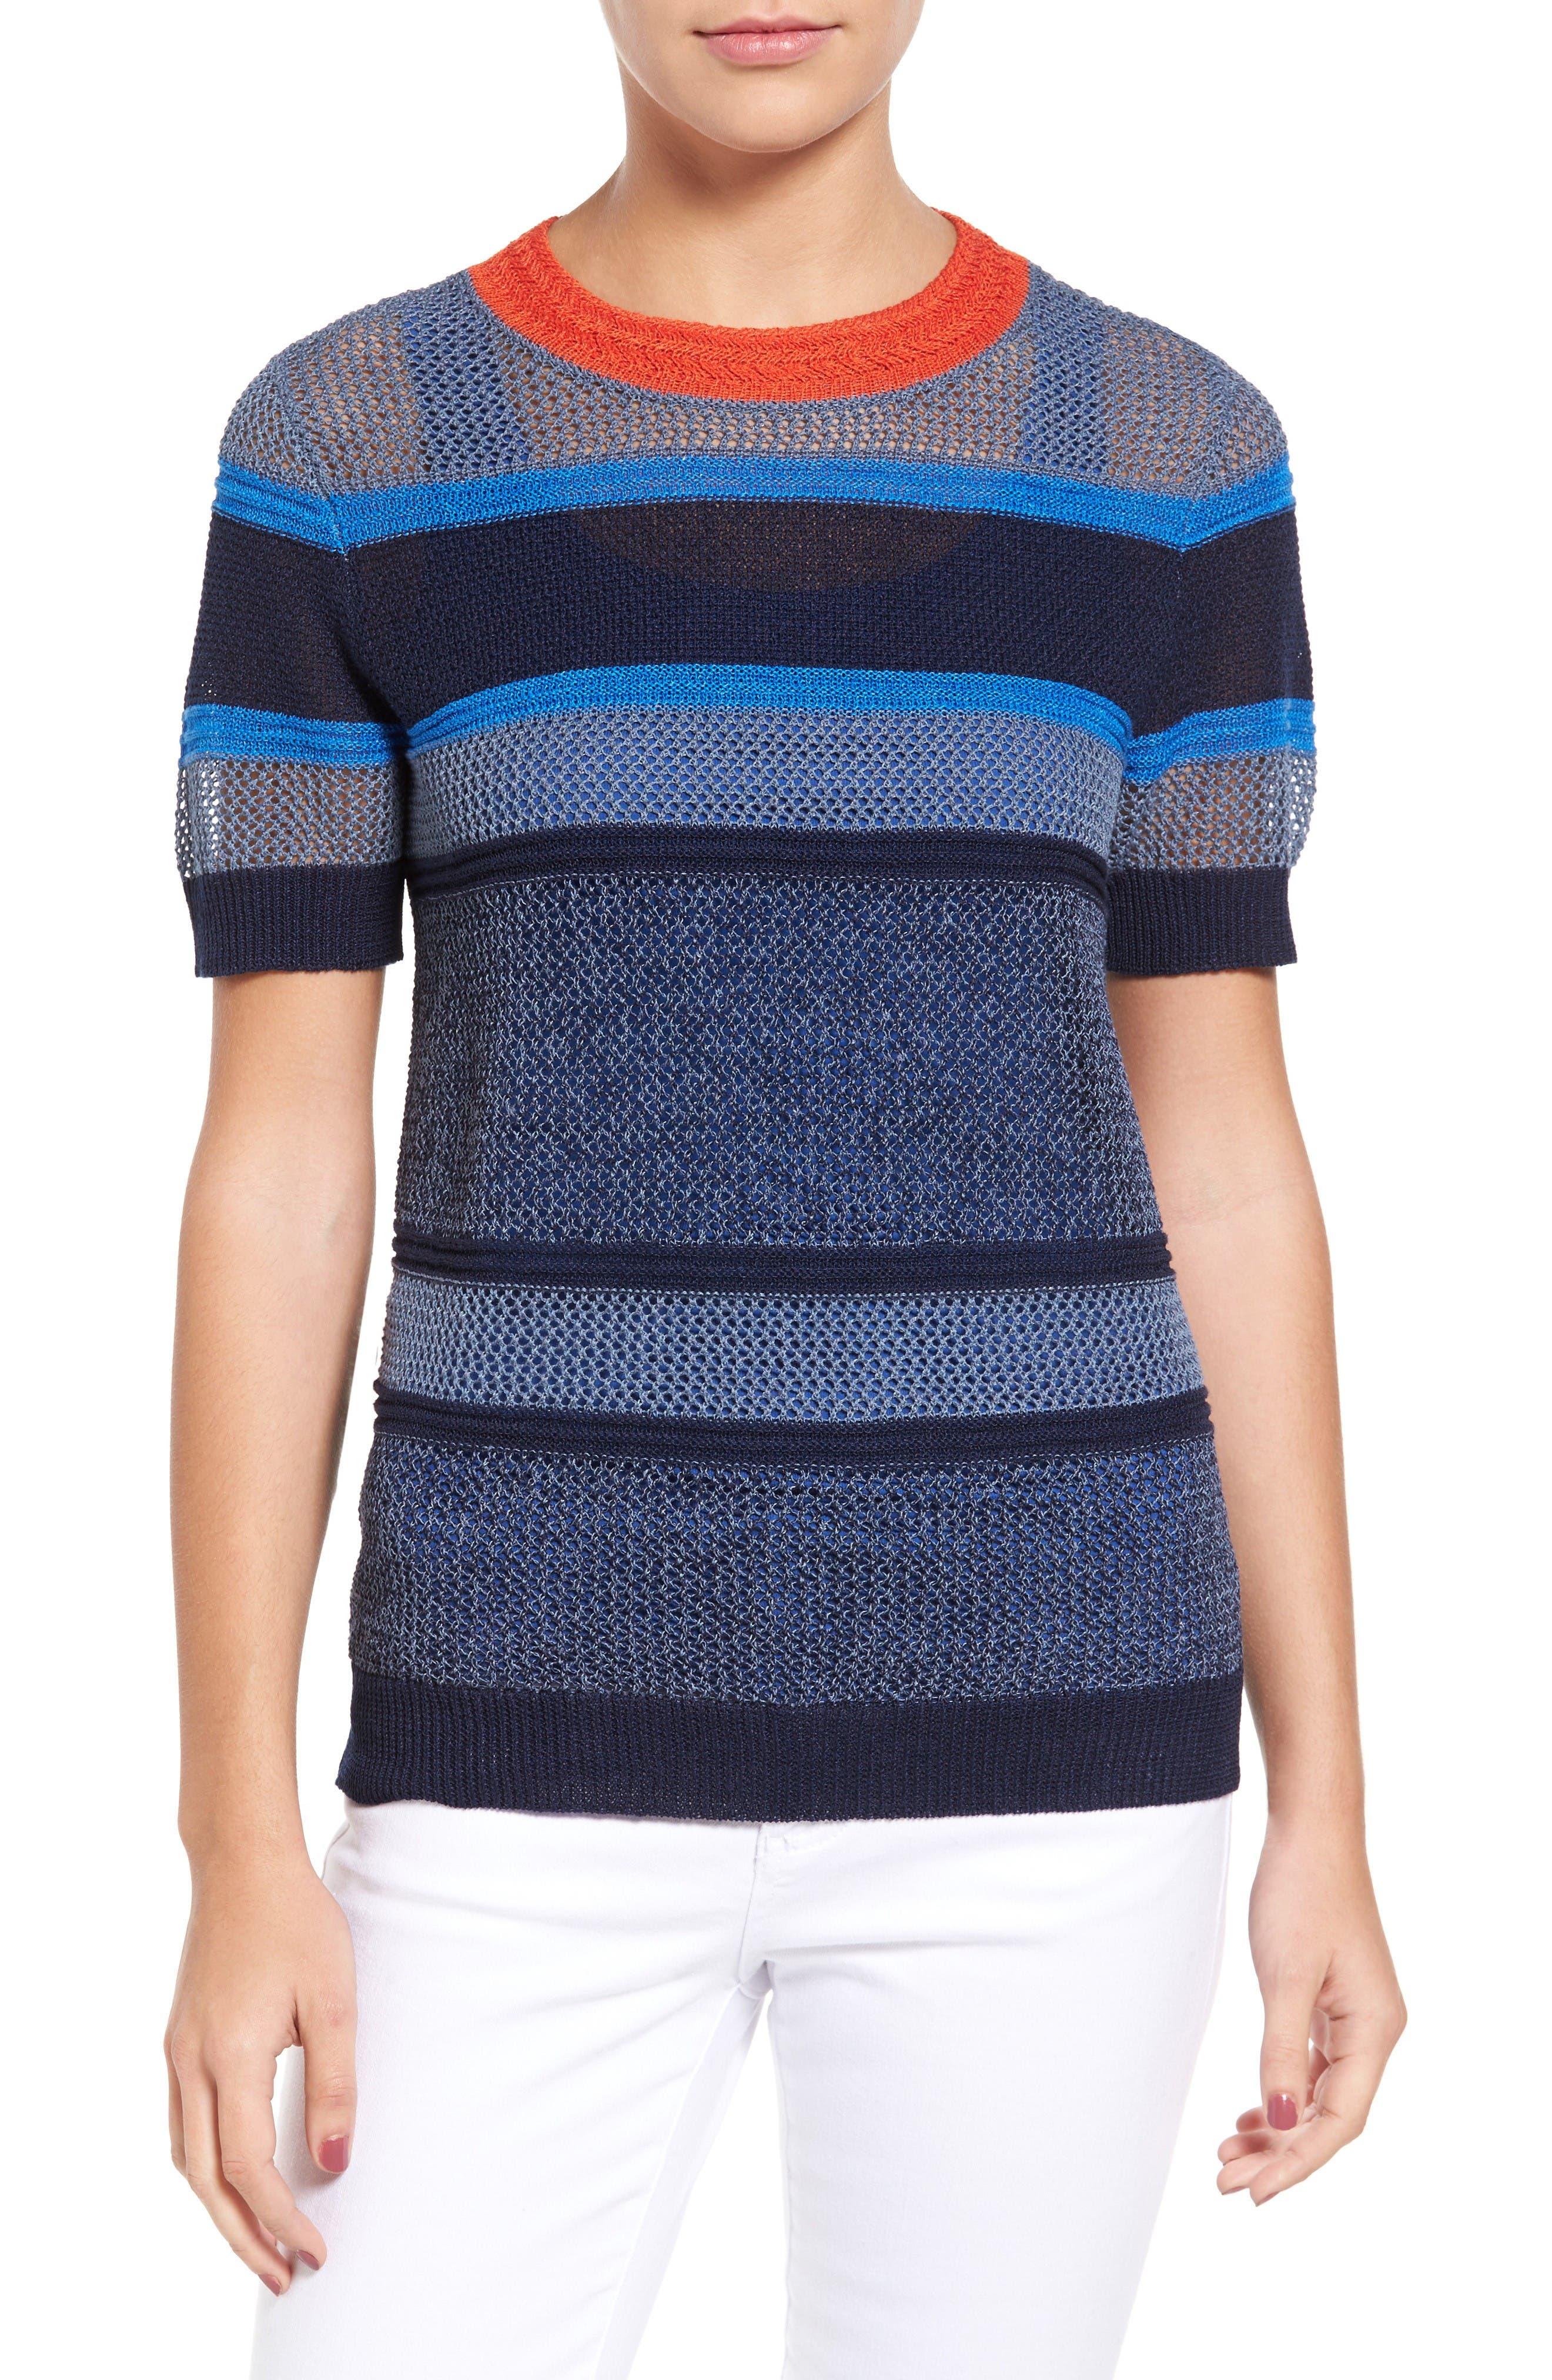 Alternate Image 1 Selected - Halogen® Stripe Open Stitch Sweater (Regular & Petite)